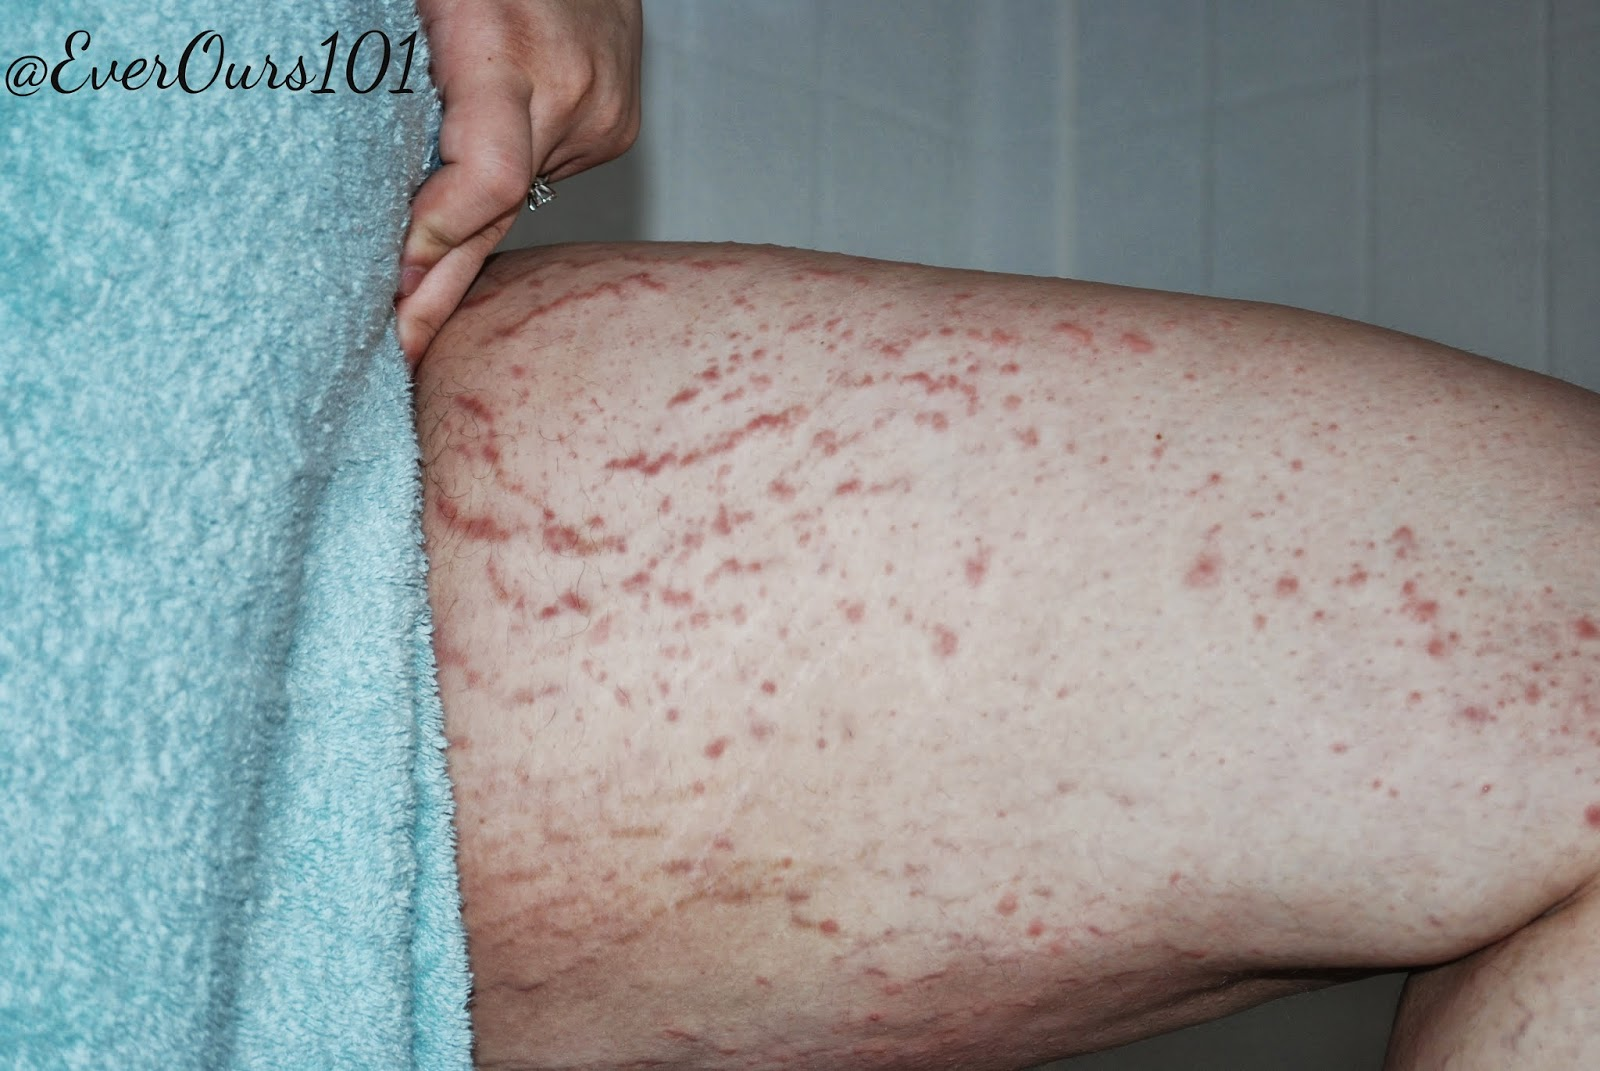 Rash Causes, Symptoms, Treatment - eMedicineHealth